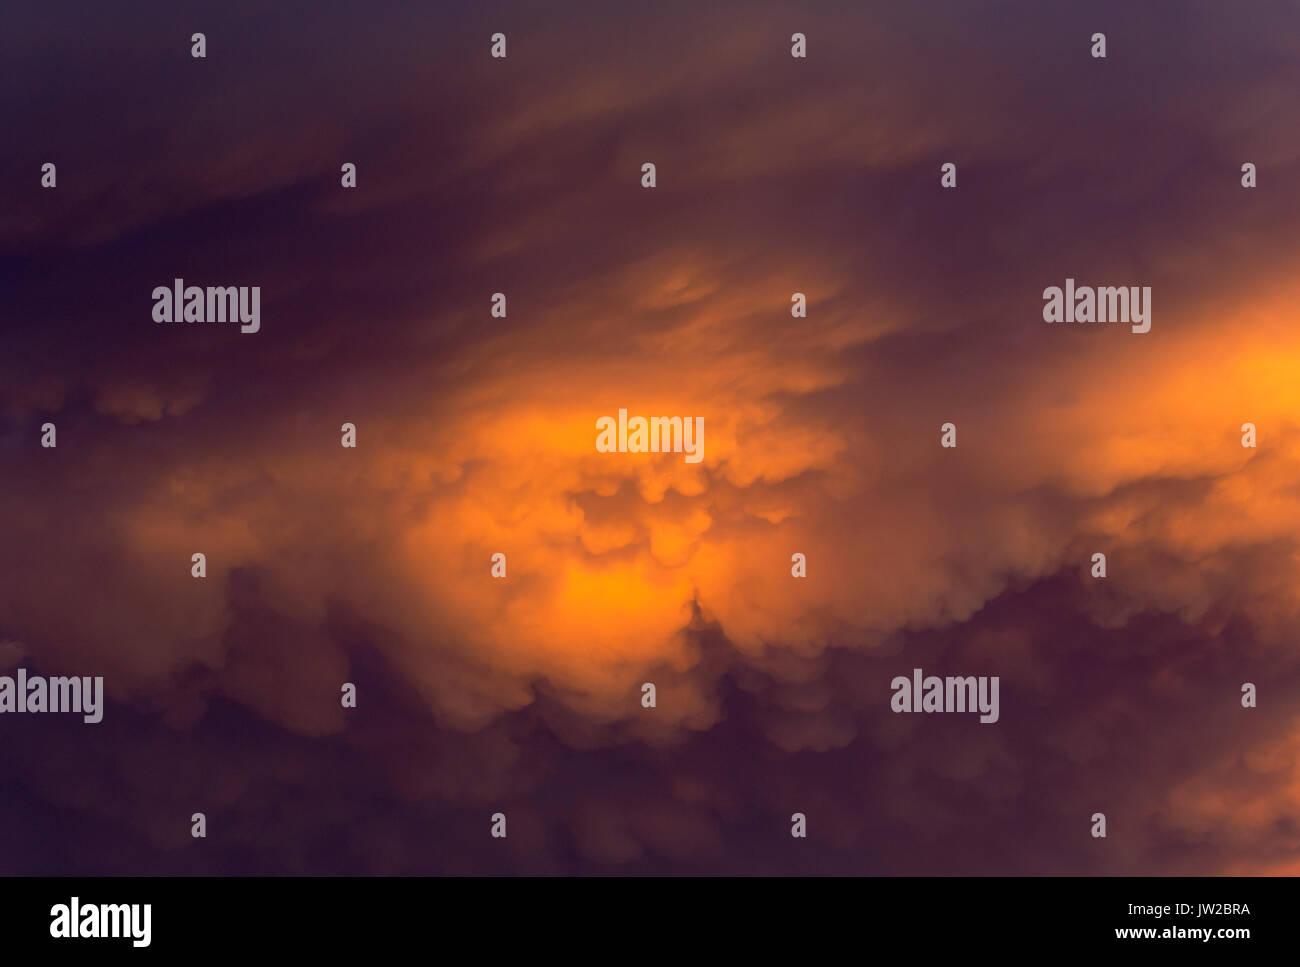 Cumulonimbus cloud in the evening, rainy season, Kalahari Desert, Kgalagadi Transfrontier Park, South Africa - Stock Image